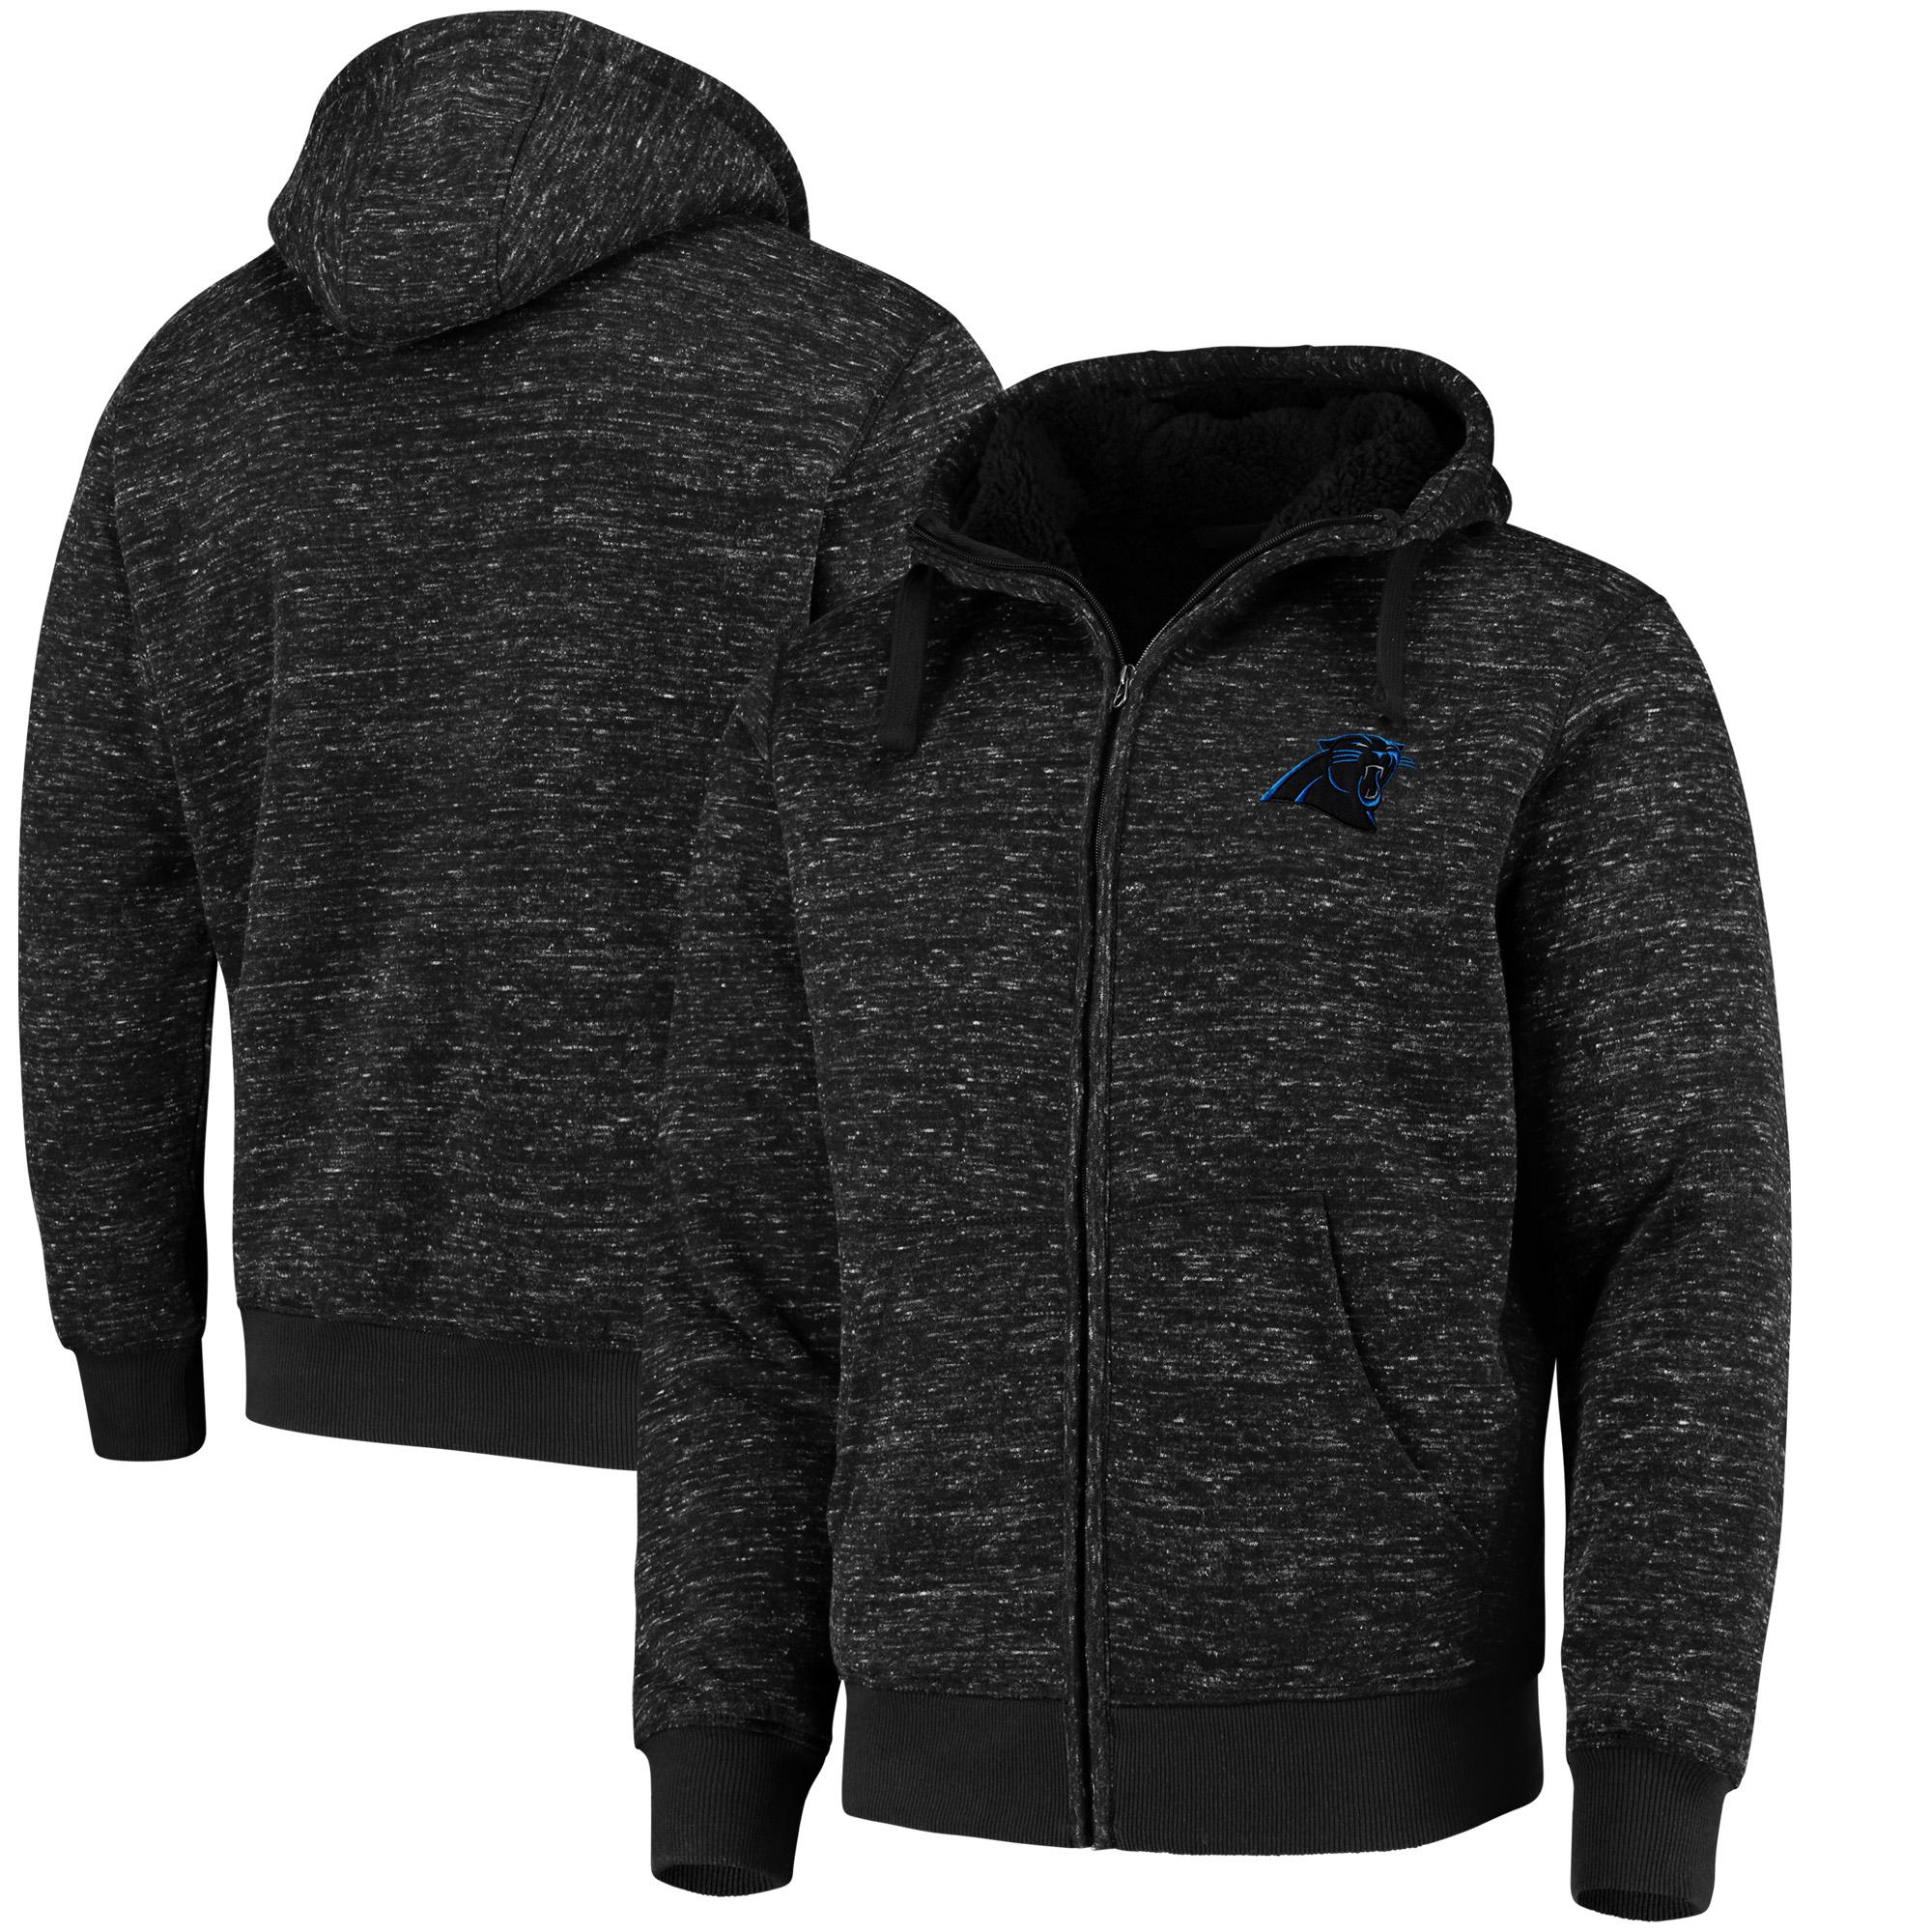 Carolina Panthers G-III Sports by Carl Banks Discovery Sherpa Full-Zip Jacket - Heathered Black